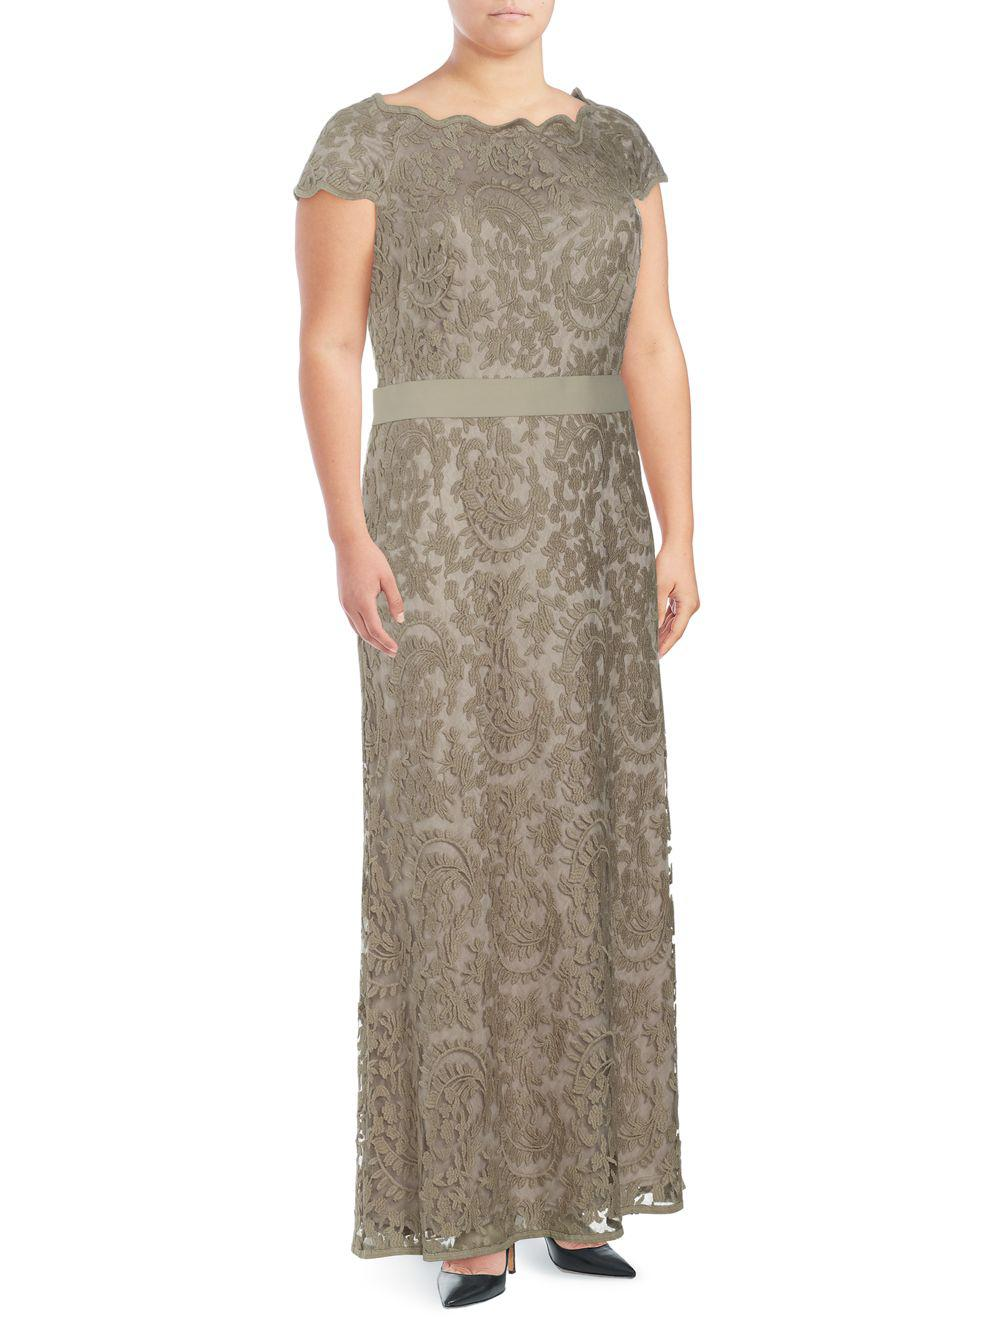 Lyst - Tadashi Shoji Embroidered Lace Floor-length Dress